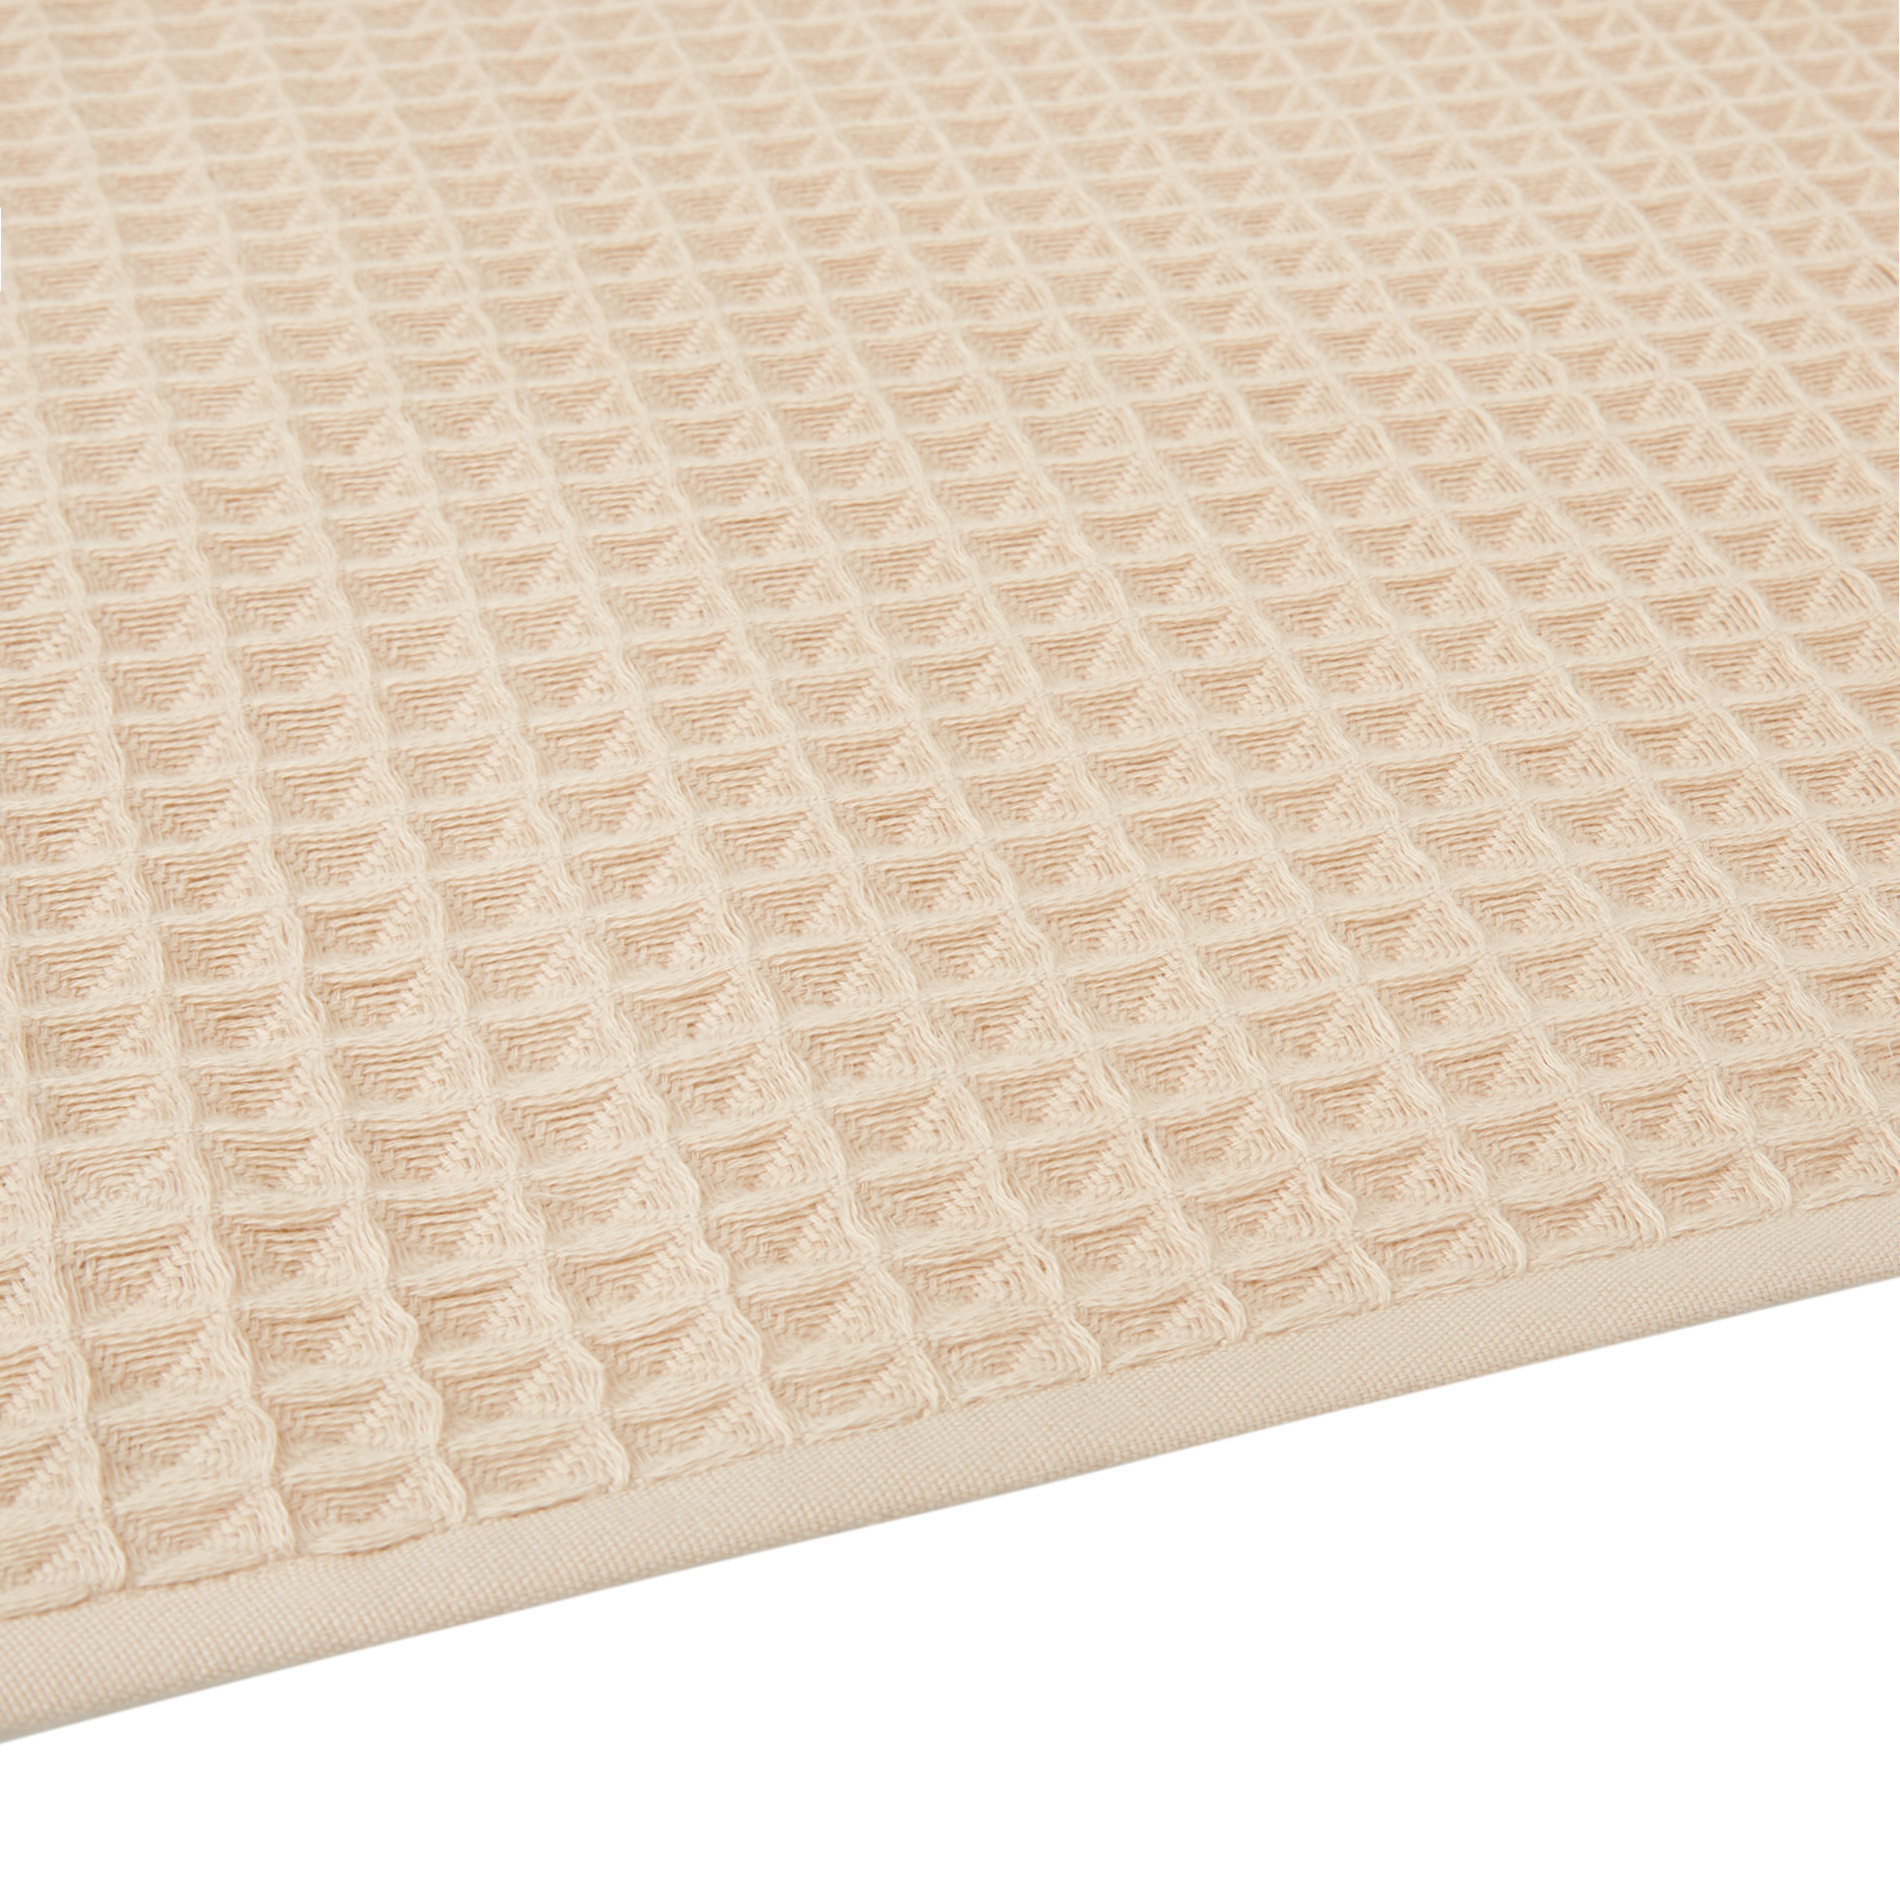 Set 2 asciugamani puro cotone nido d'ape tinta unita, Beige, large image number 2